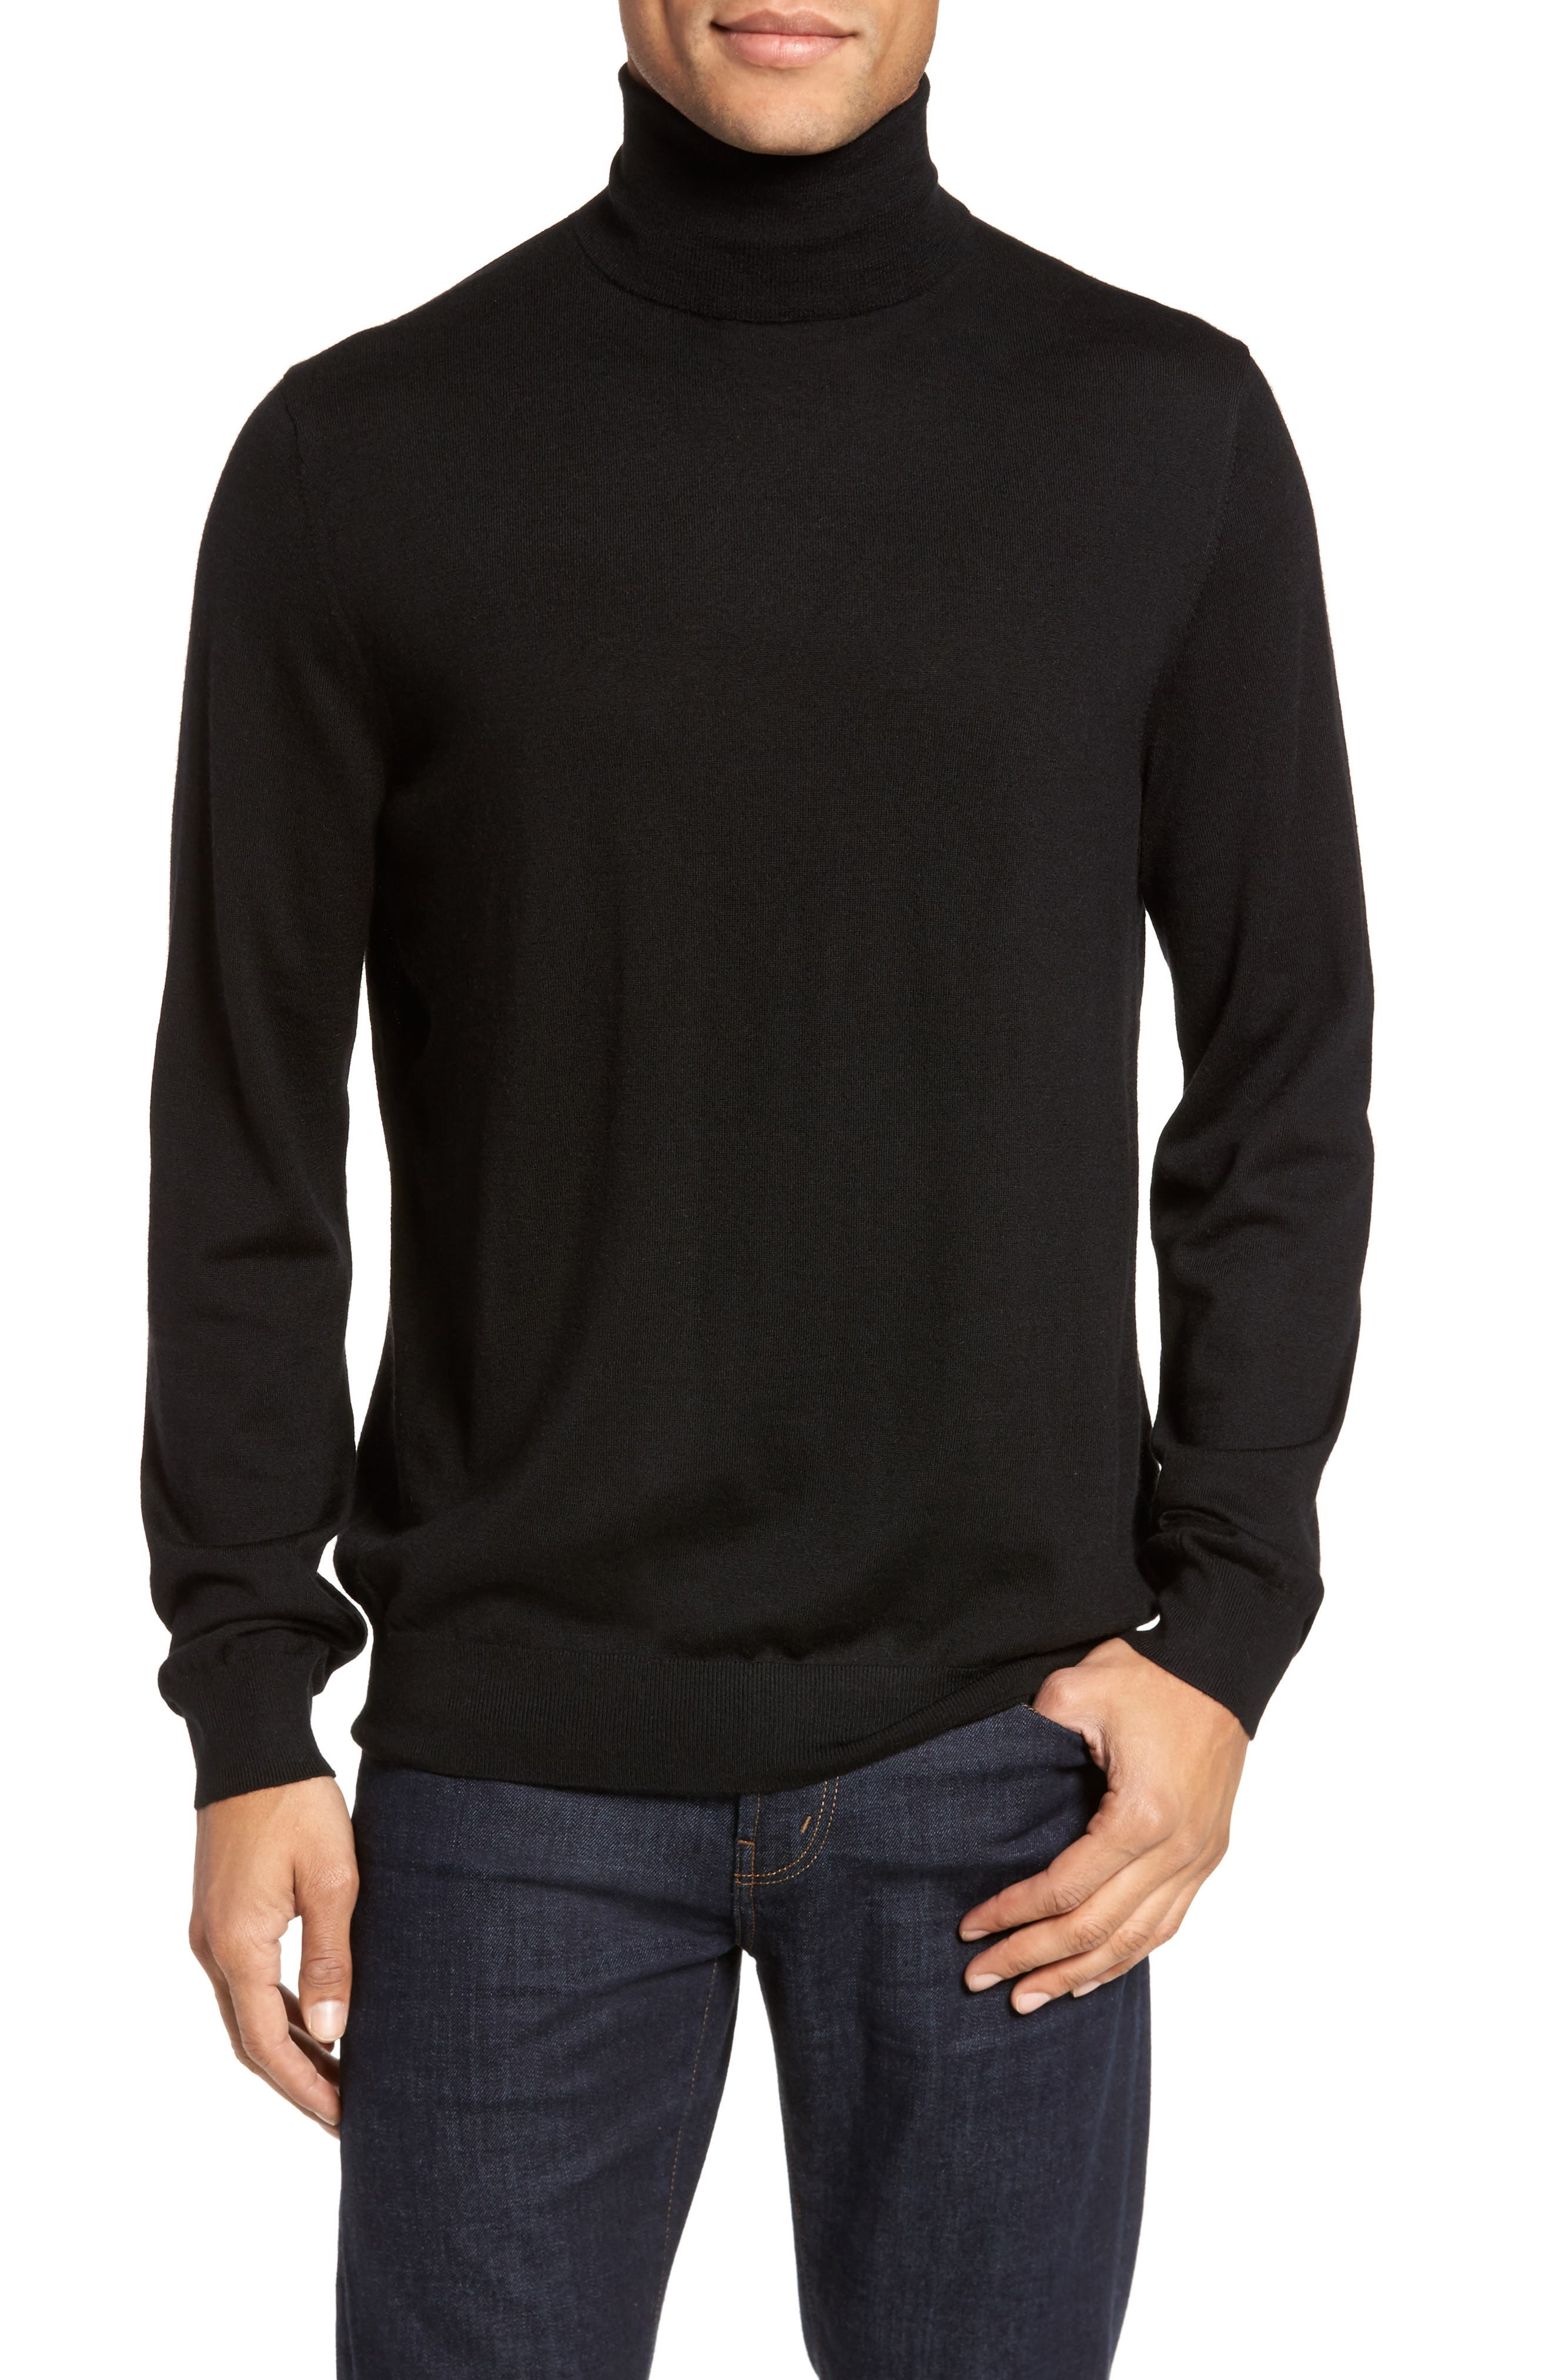 Turtleneck Sweater,                             Main thumbnail 1, color,                             001